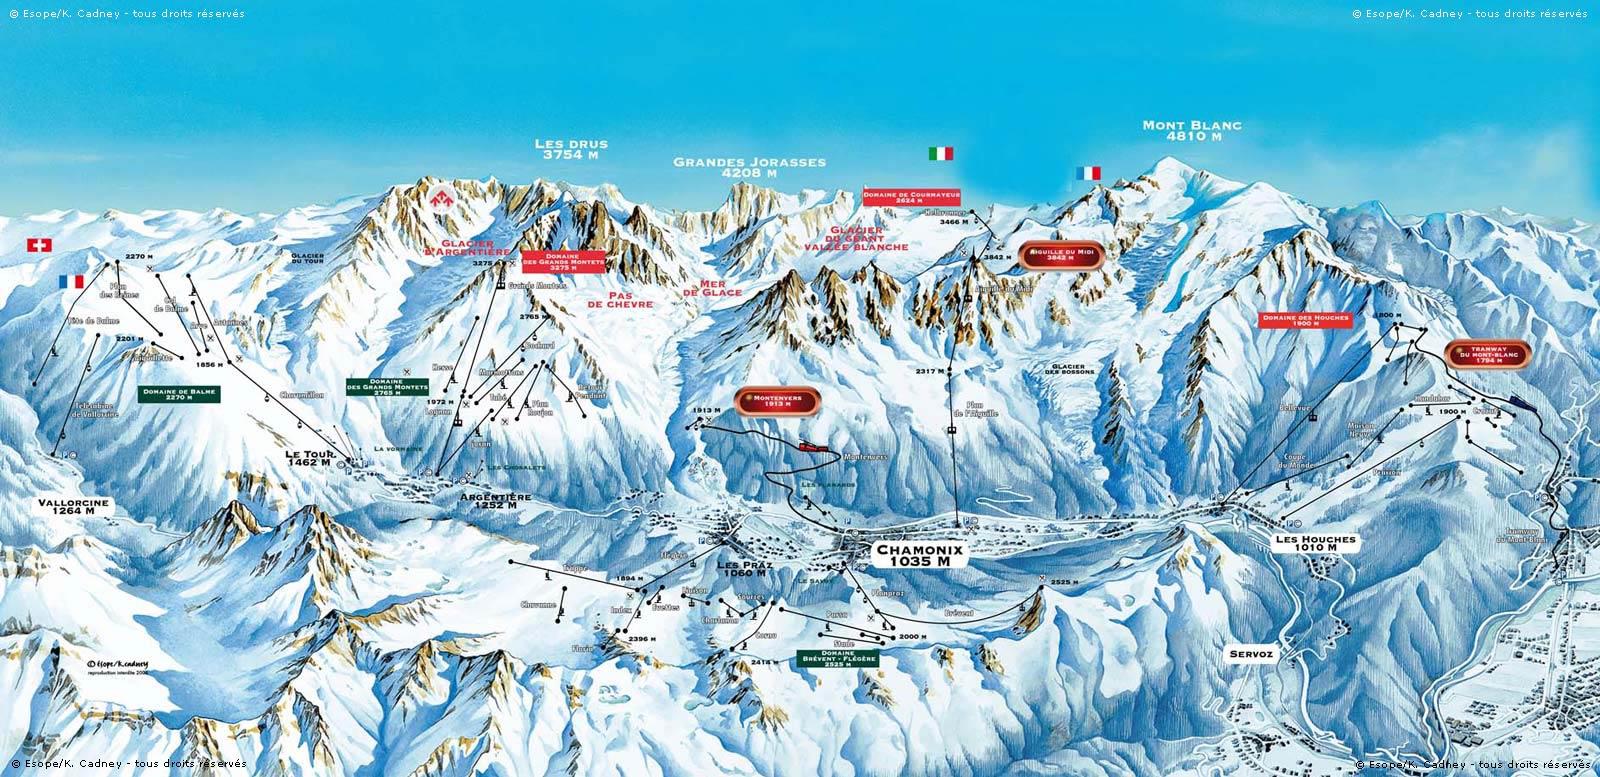 Après Ski in Chamonix | The Ultimate Guide | PowderBeds